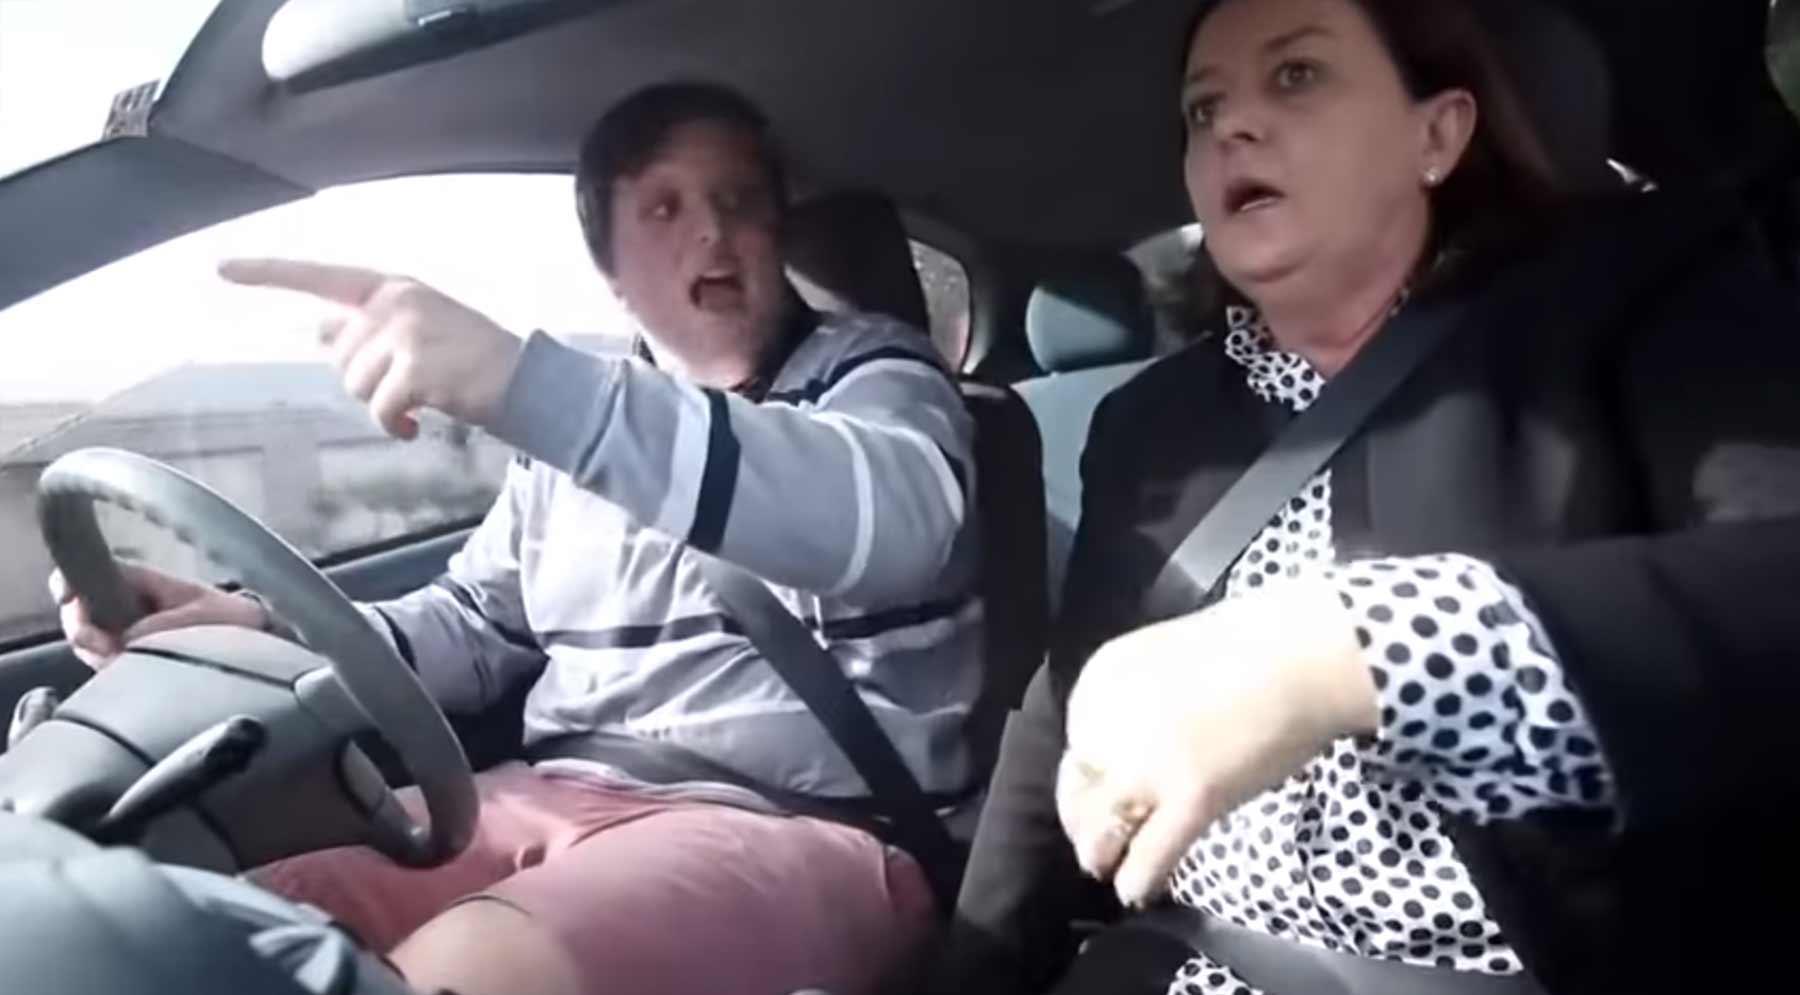 Fahrtraining mit Mama und Papa fahrtraining-mit-mama-und-papa